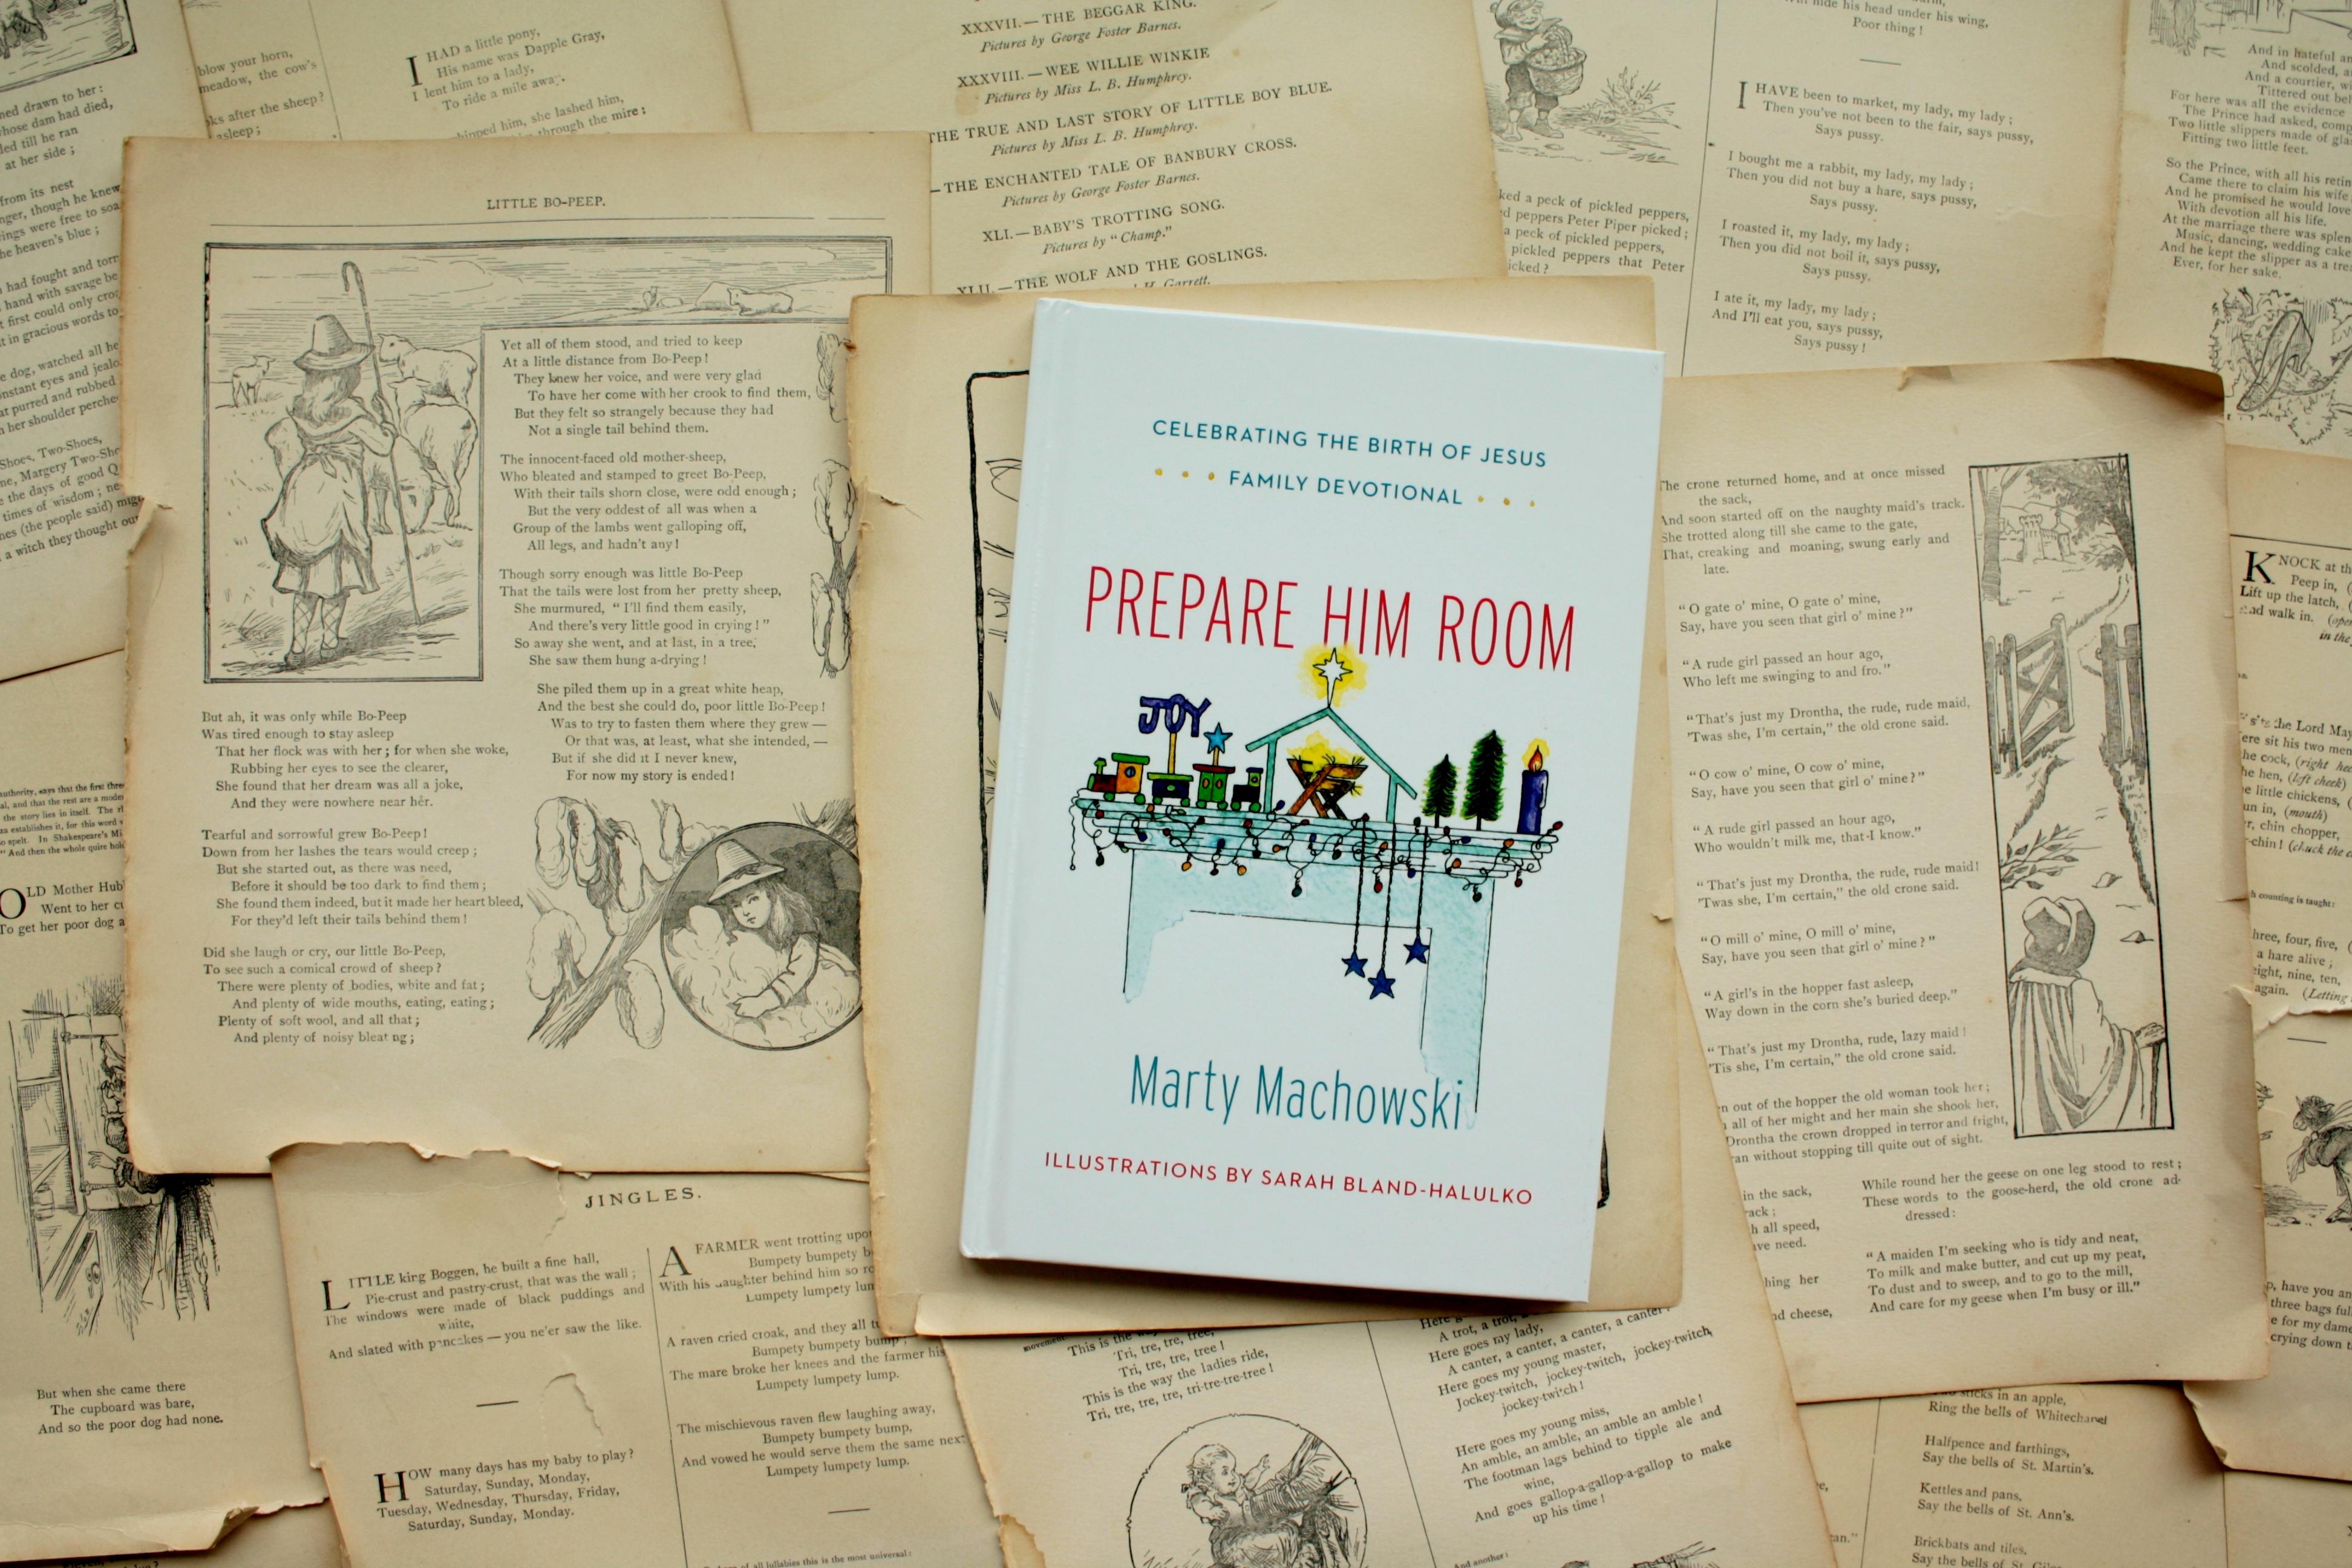 Prepare Him Room | Marty Machowski